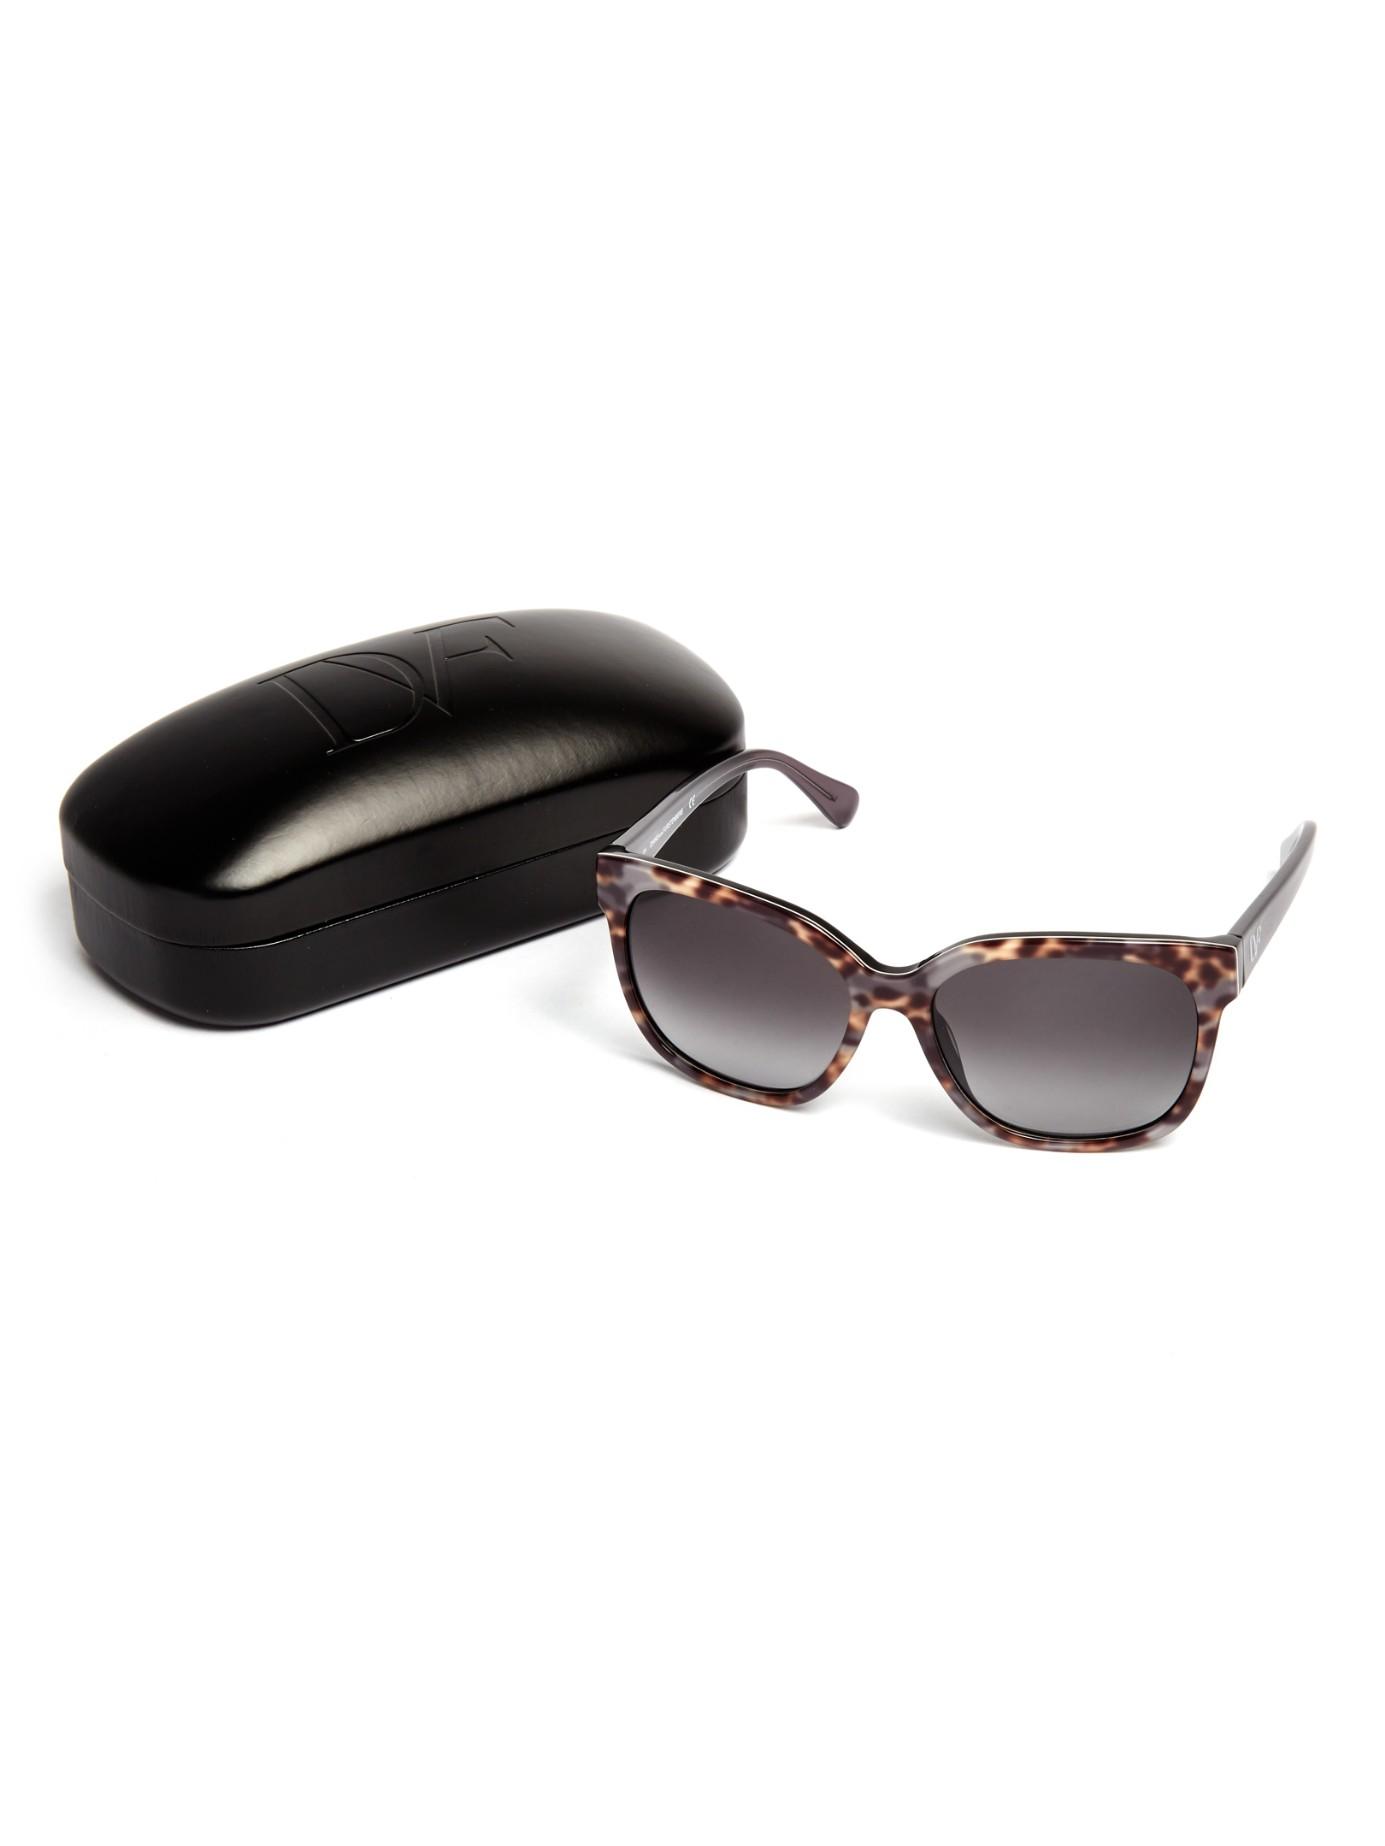 f32584a91d Diane von Furstenberg Julianna Sunglasses in Black - Lyst